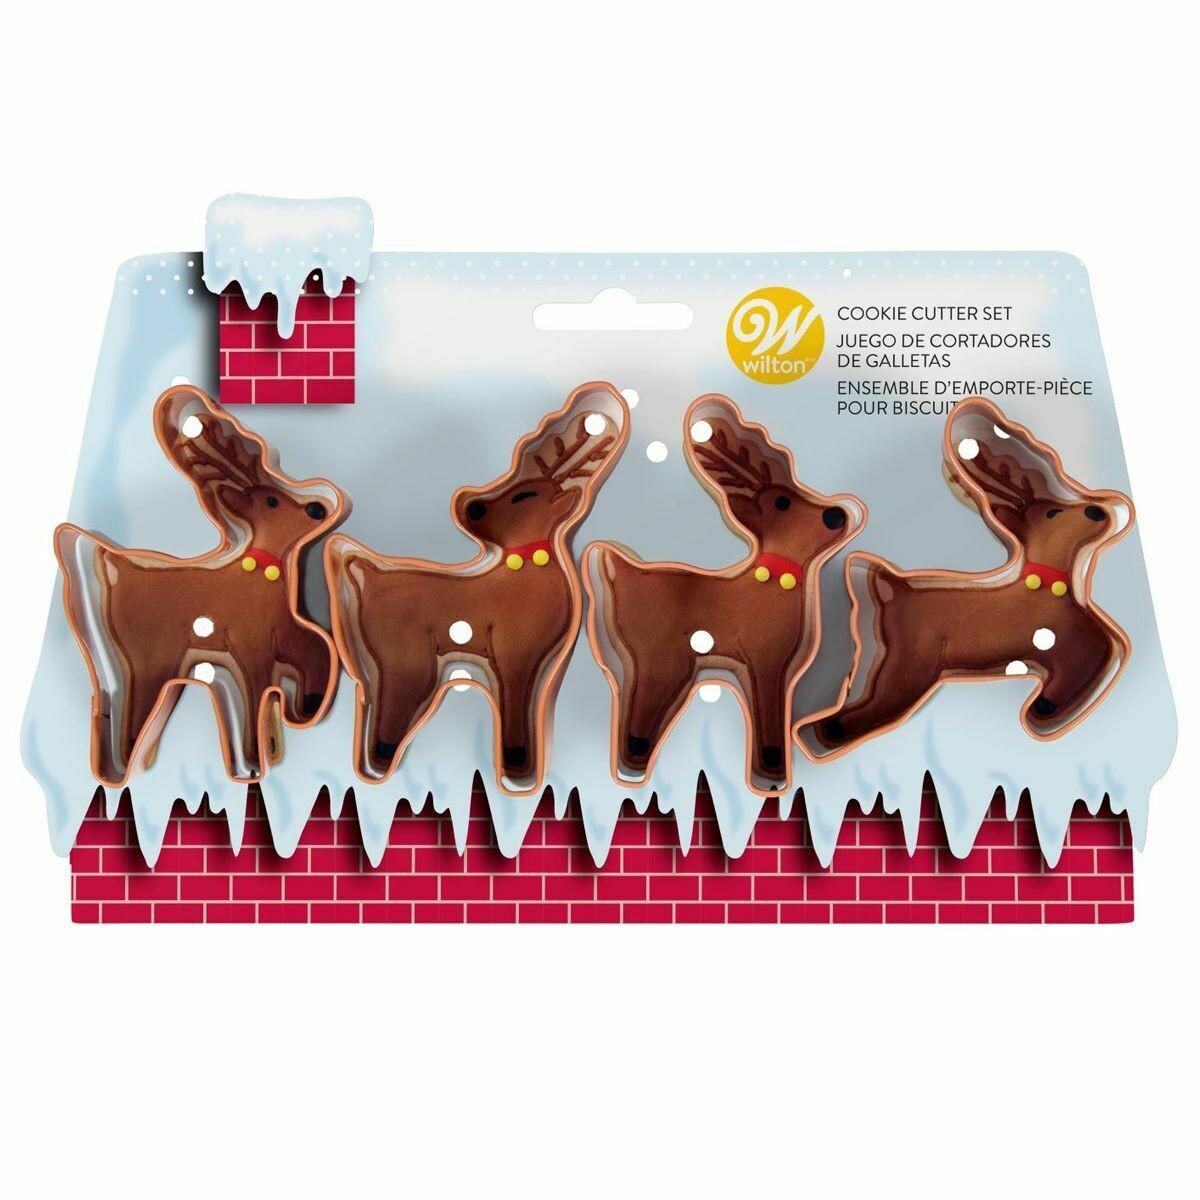 Wilton Christmas -Set of 4 Cutters -REINDEERS - Σετ 4τεμ κουπ πατ Τάρανδοι